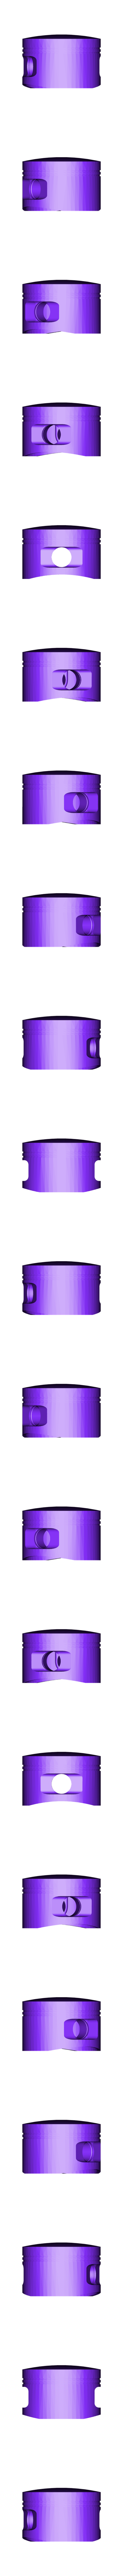 piston.STL Download free STL file Piston | car engine component  • 3D print model, kasraoui